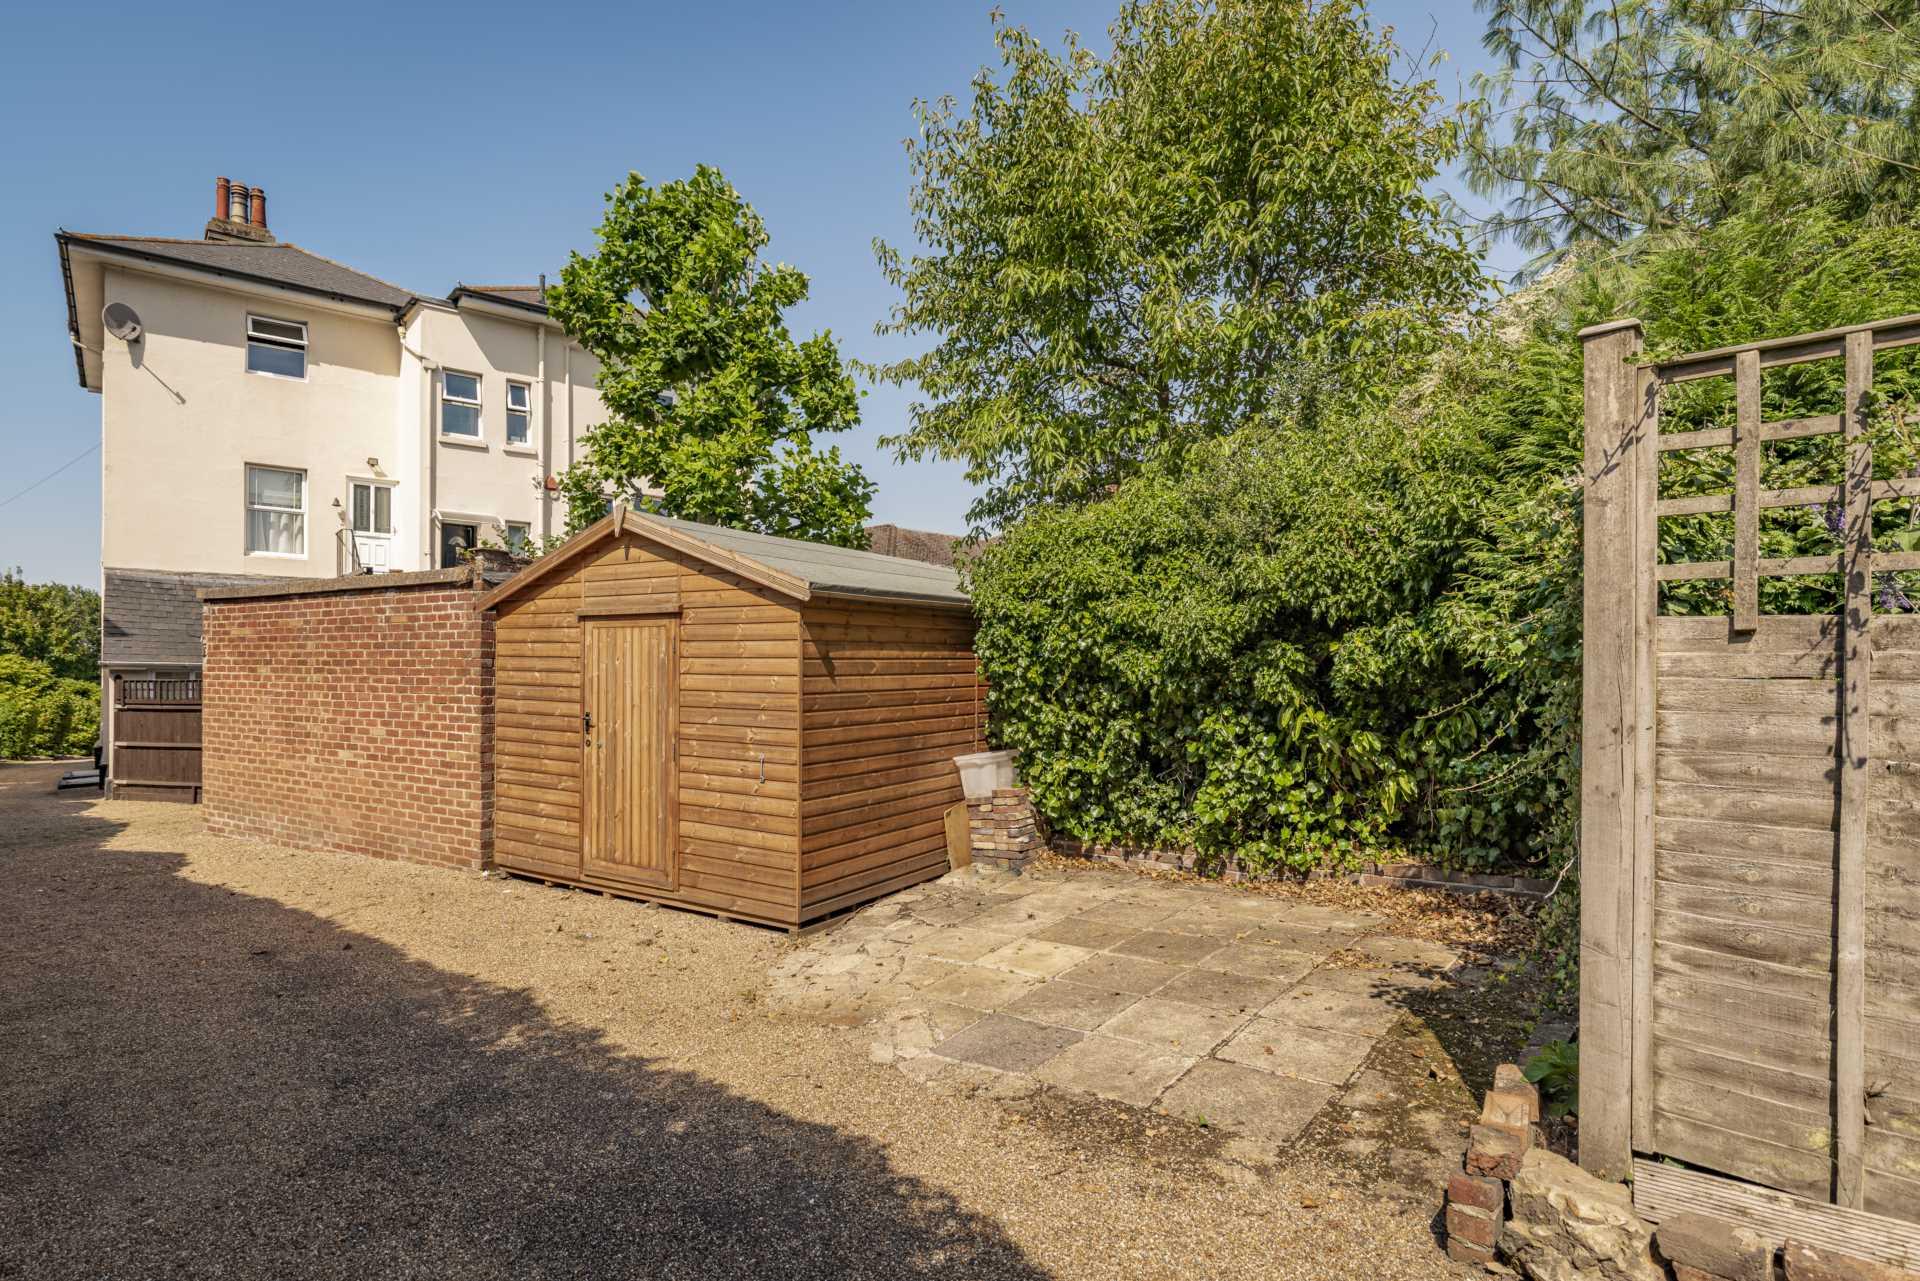 Pennington Road, Southborough, Image 9